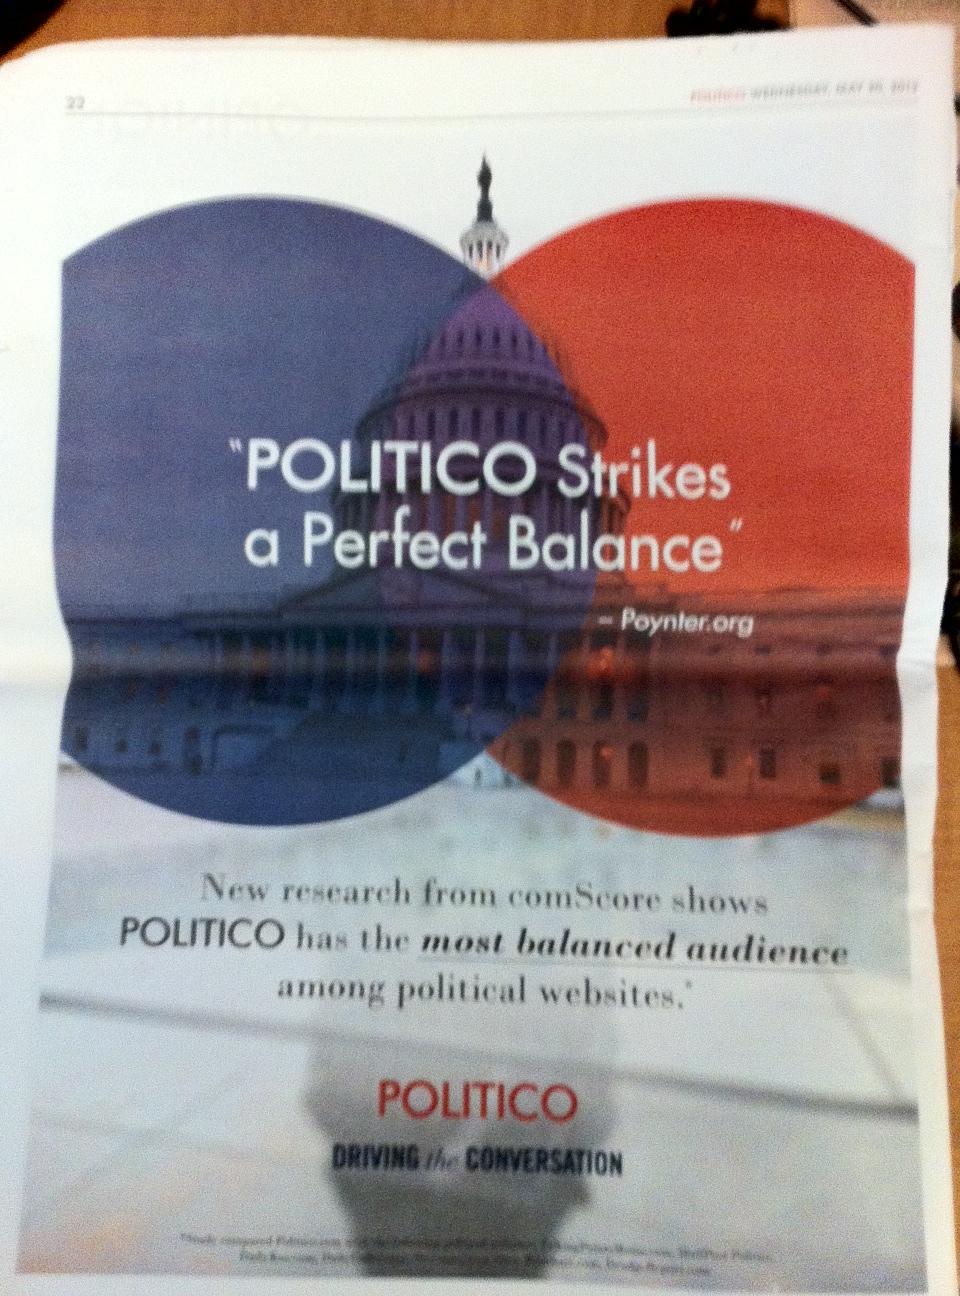 Politico Ad and Politico Article Agree: Politico Is 'Most Balanced' Political News Source